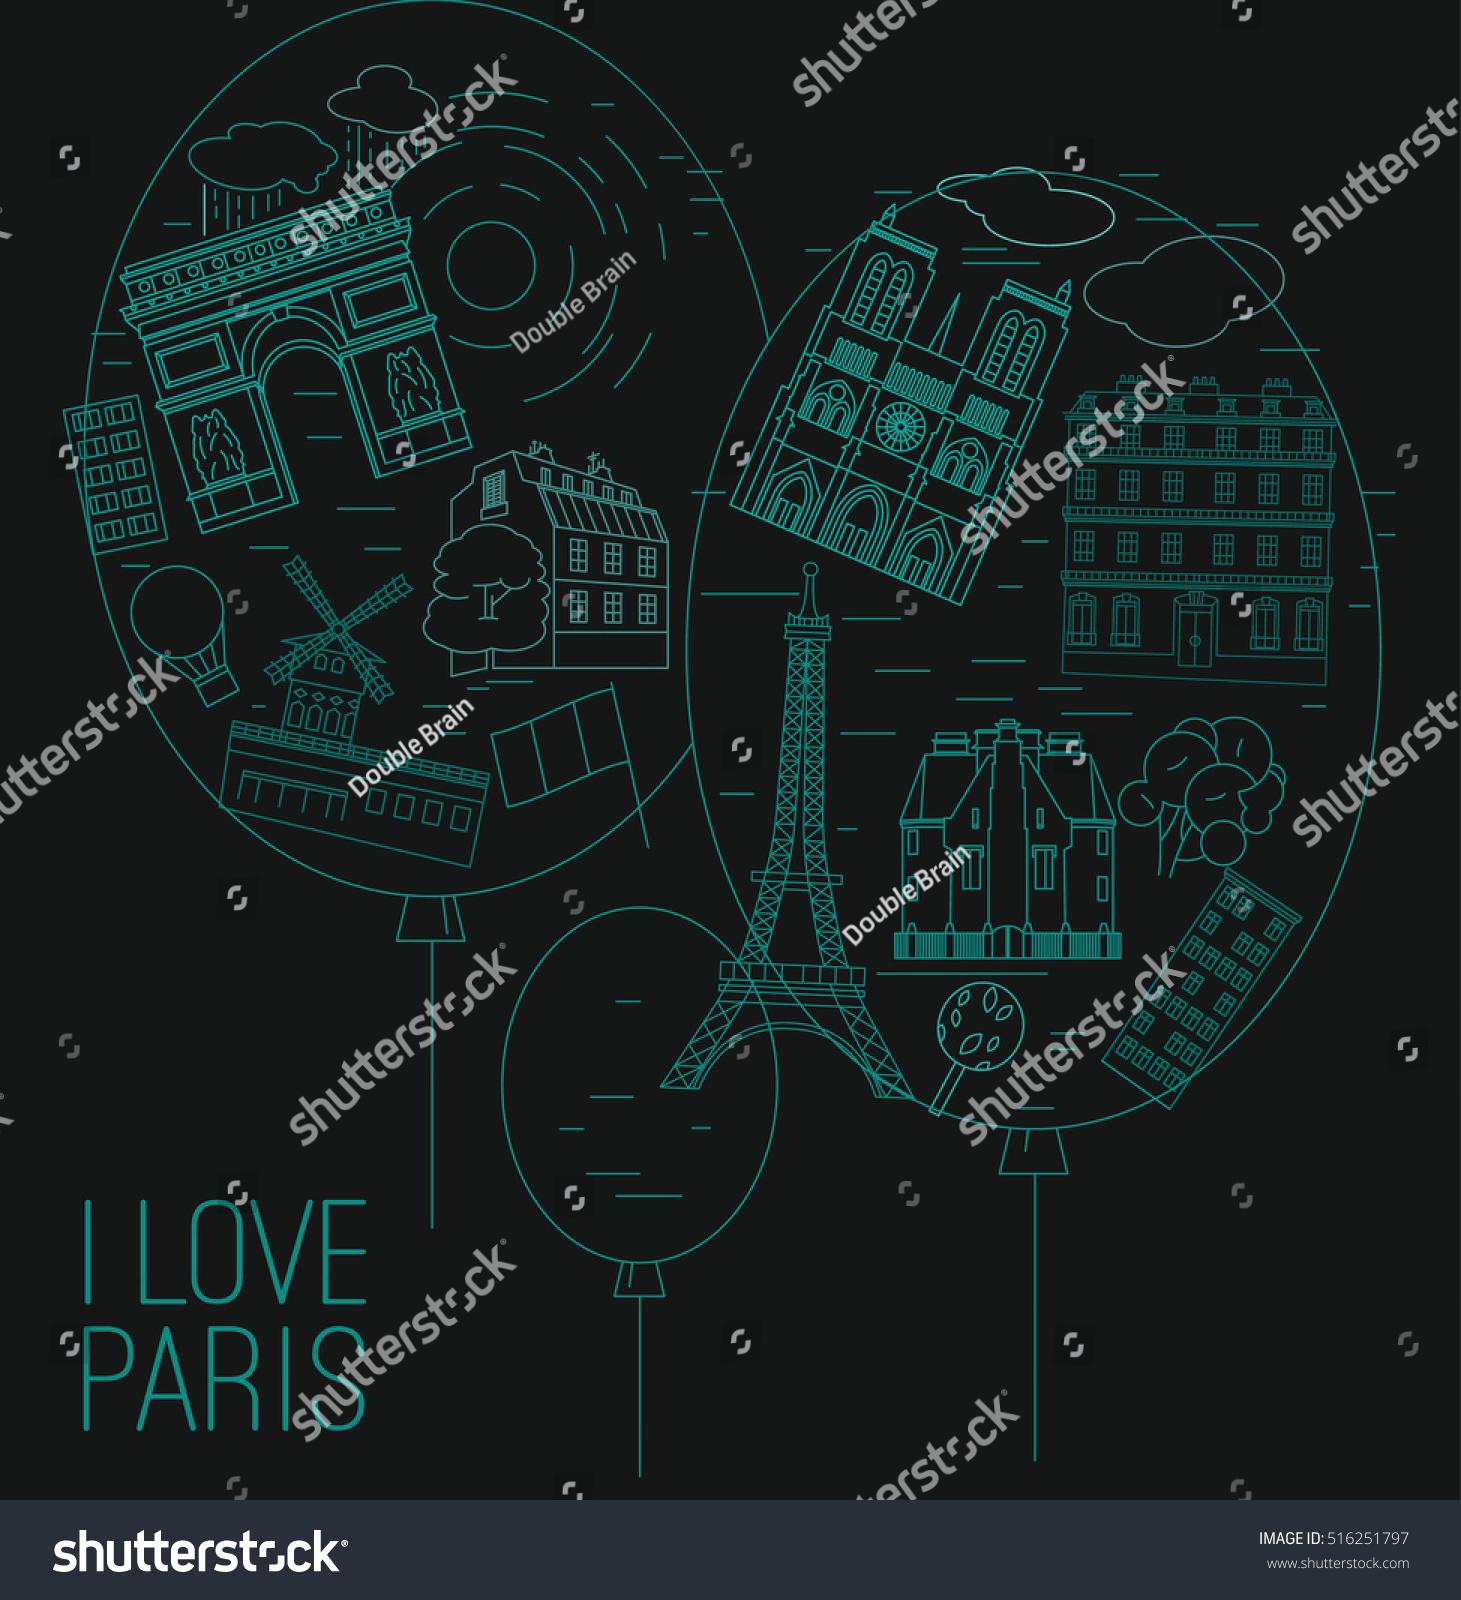 I love Paris creative concept Stylish vector